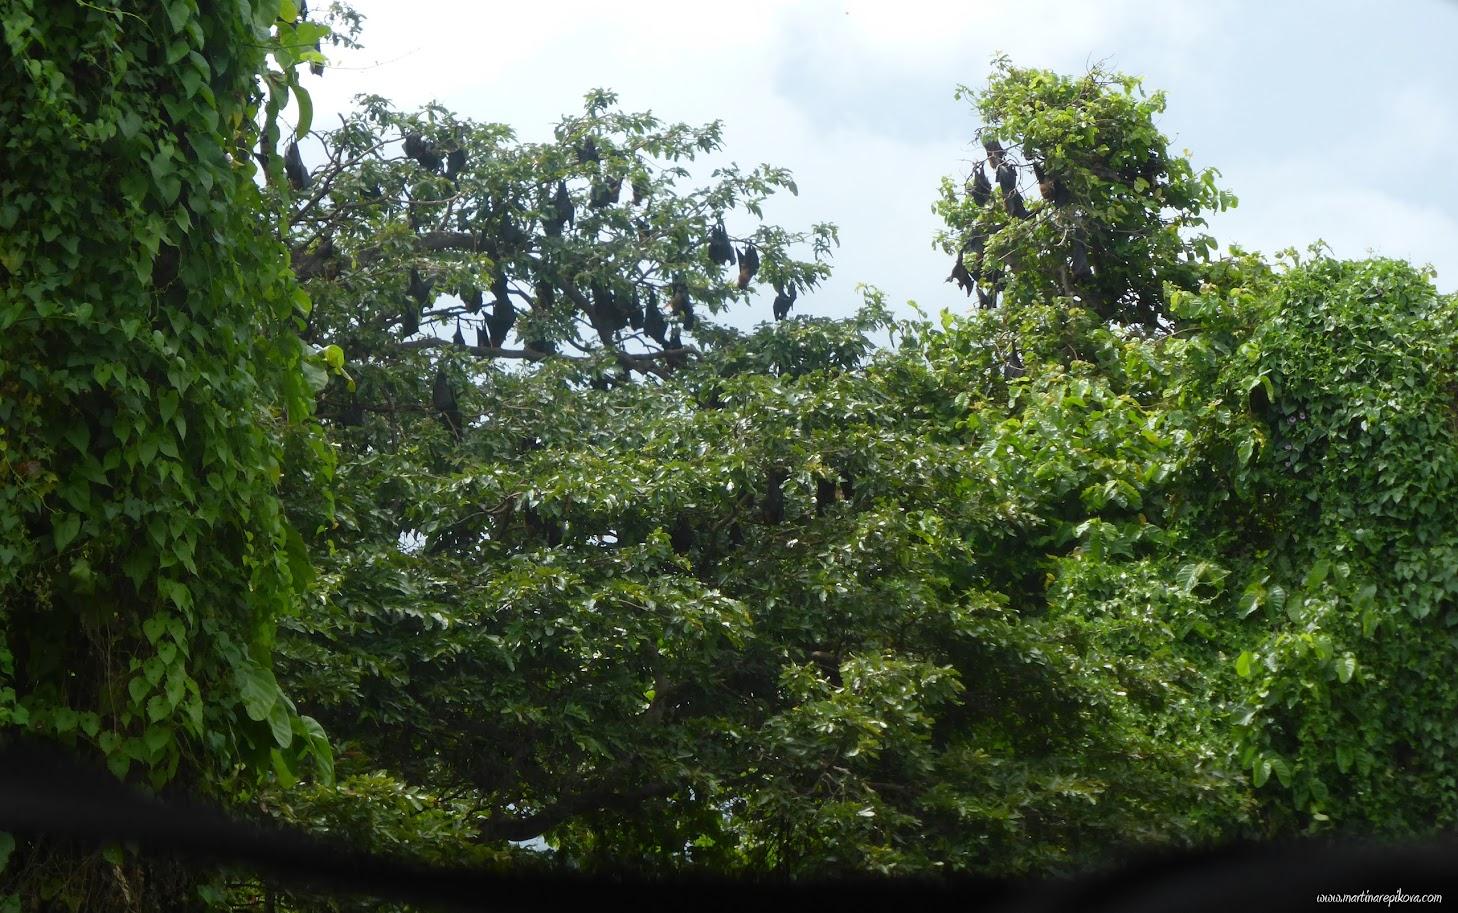 Bats on a tree, Sri Lanka